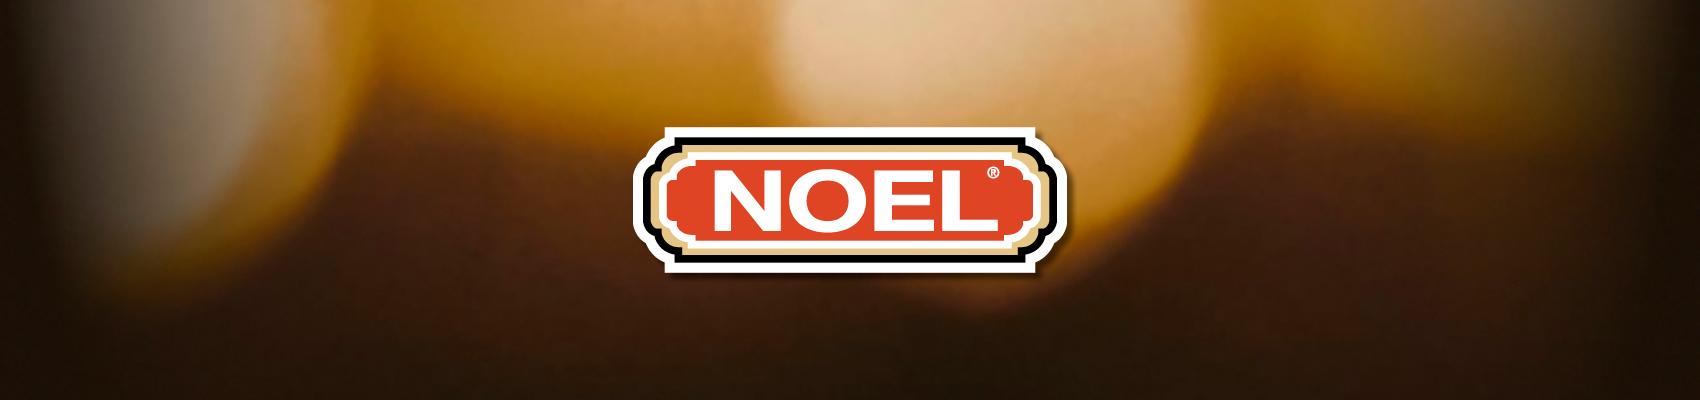 Noel-banner